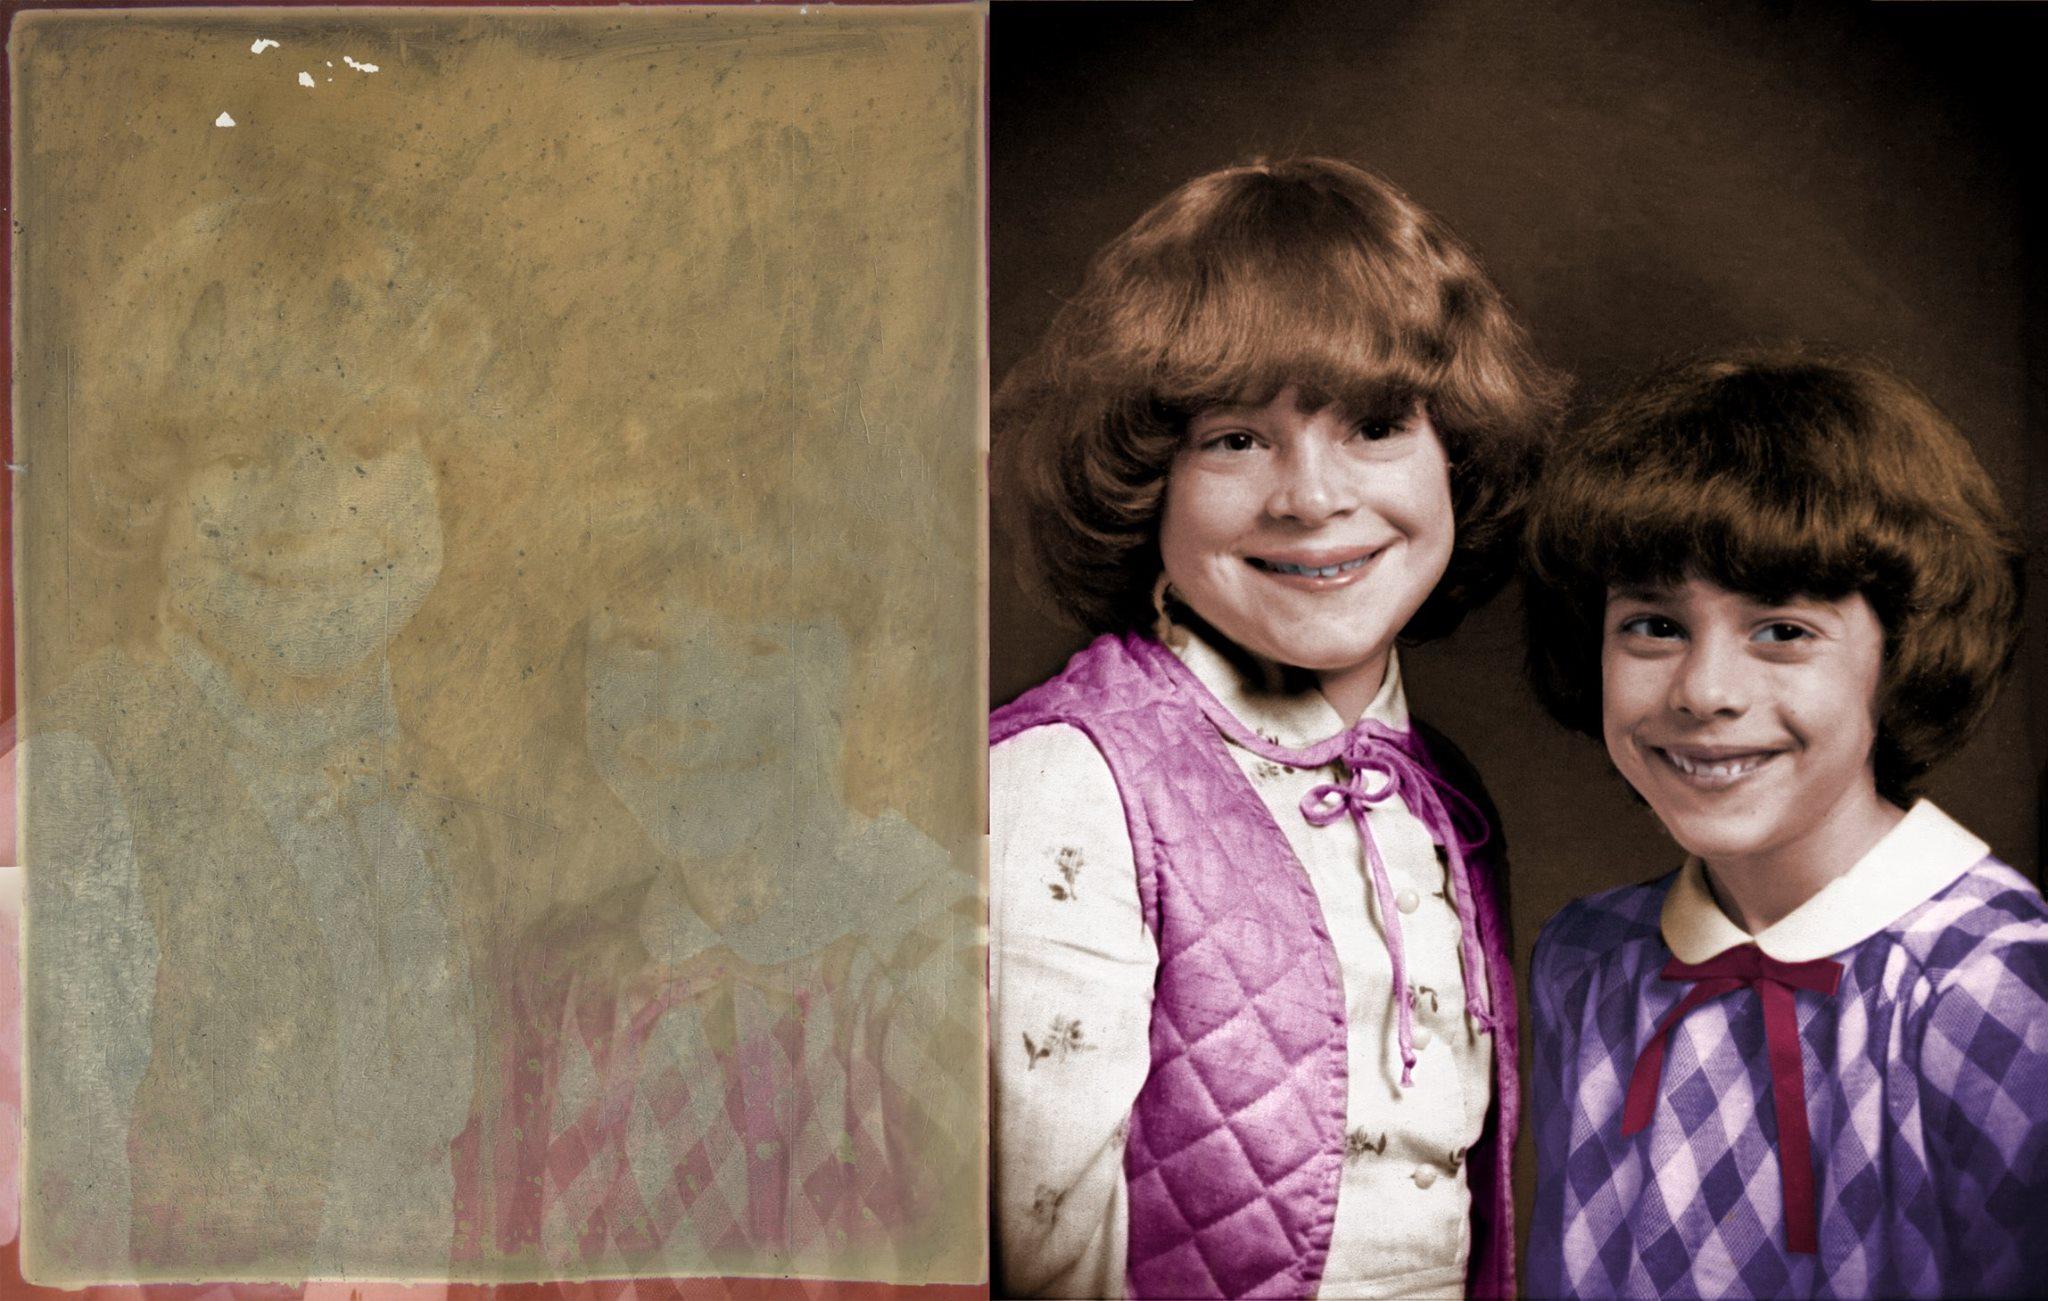 Photo Restoration and Reconstruction